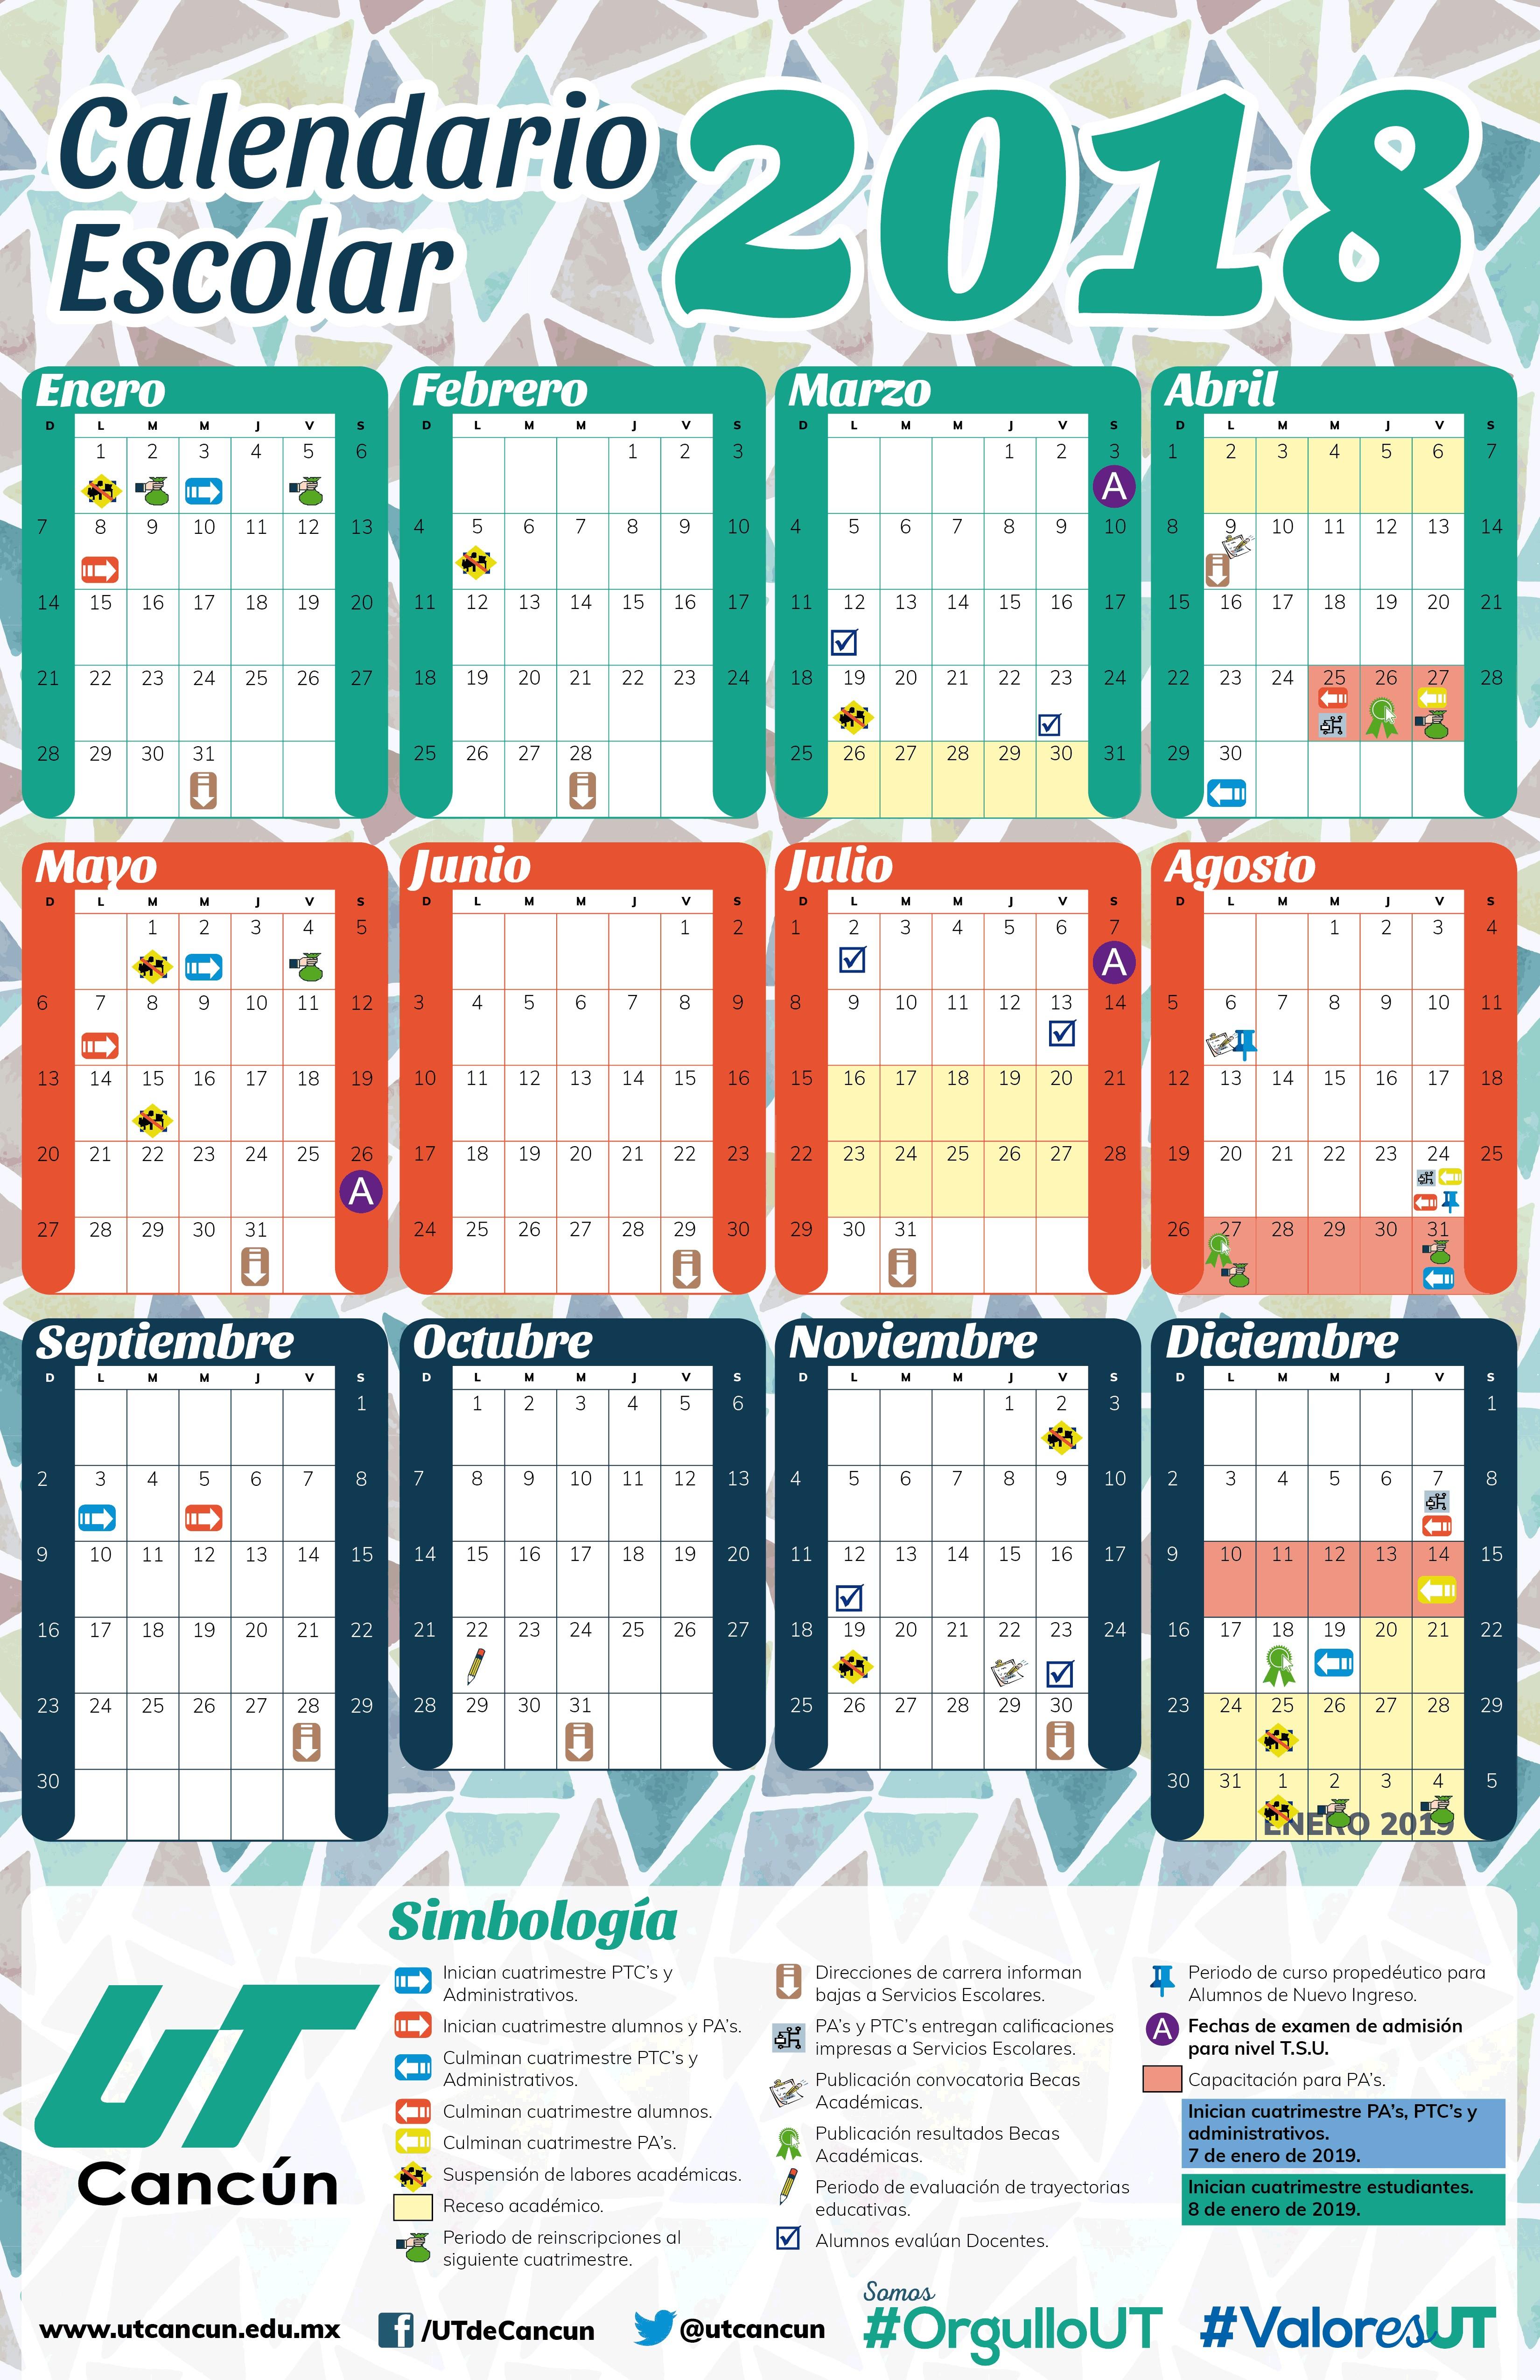 Calendario Escolar 2019 Imprimir Más Reciente Ut Cancºn Of Calendario Escolar 2019 Imprimir Actual Calendario 8 Agosto ☼ Calendario Pinterest